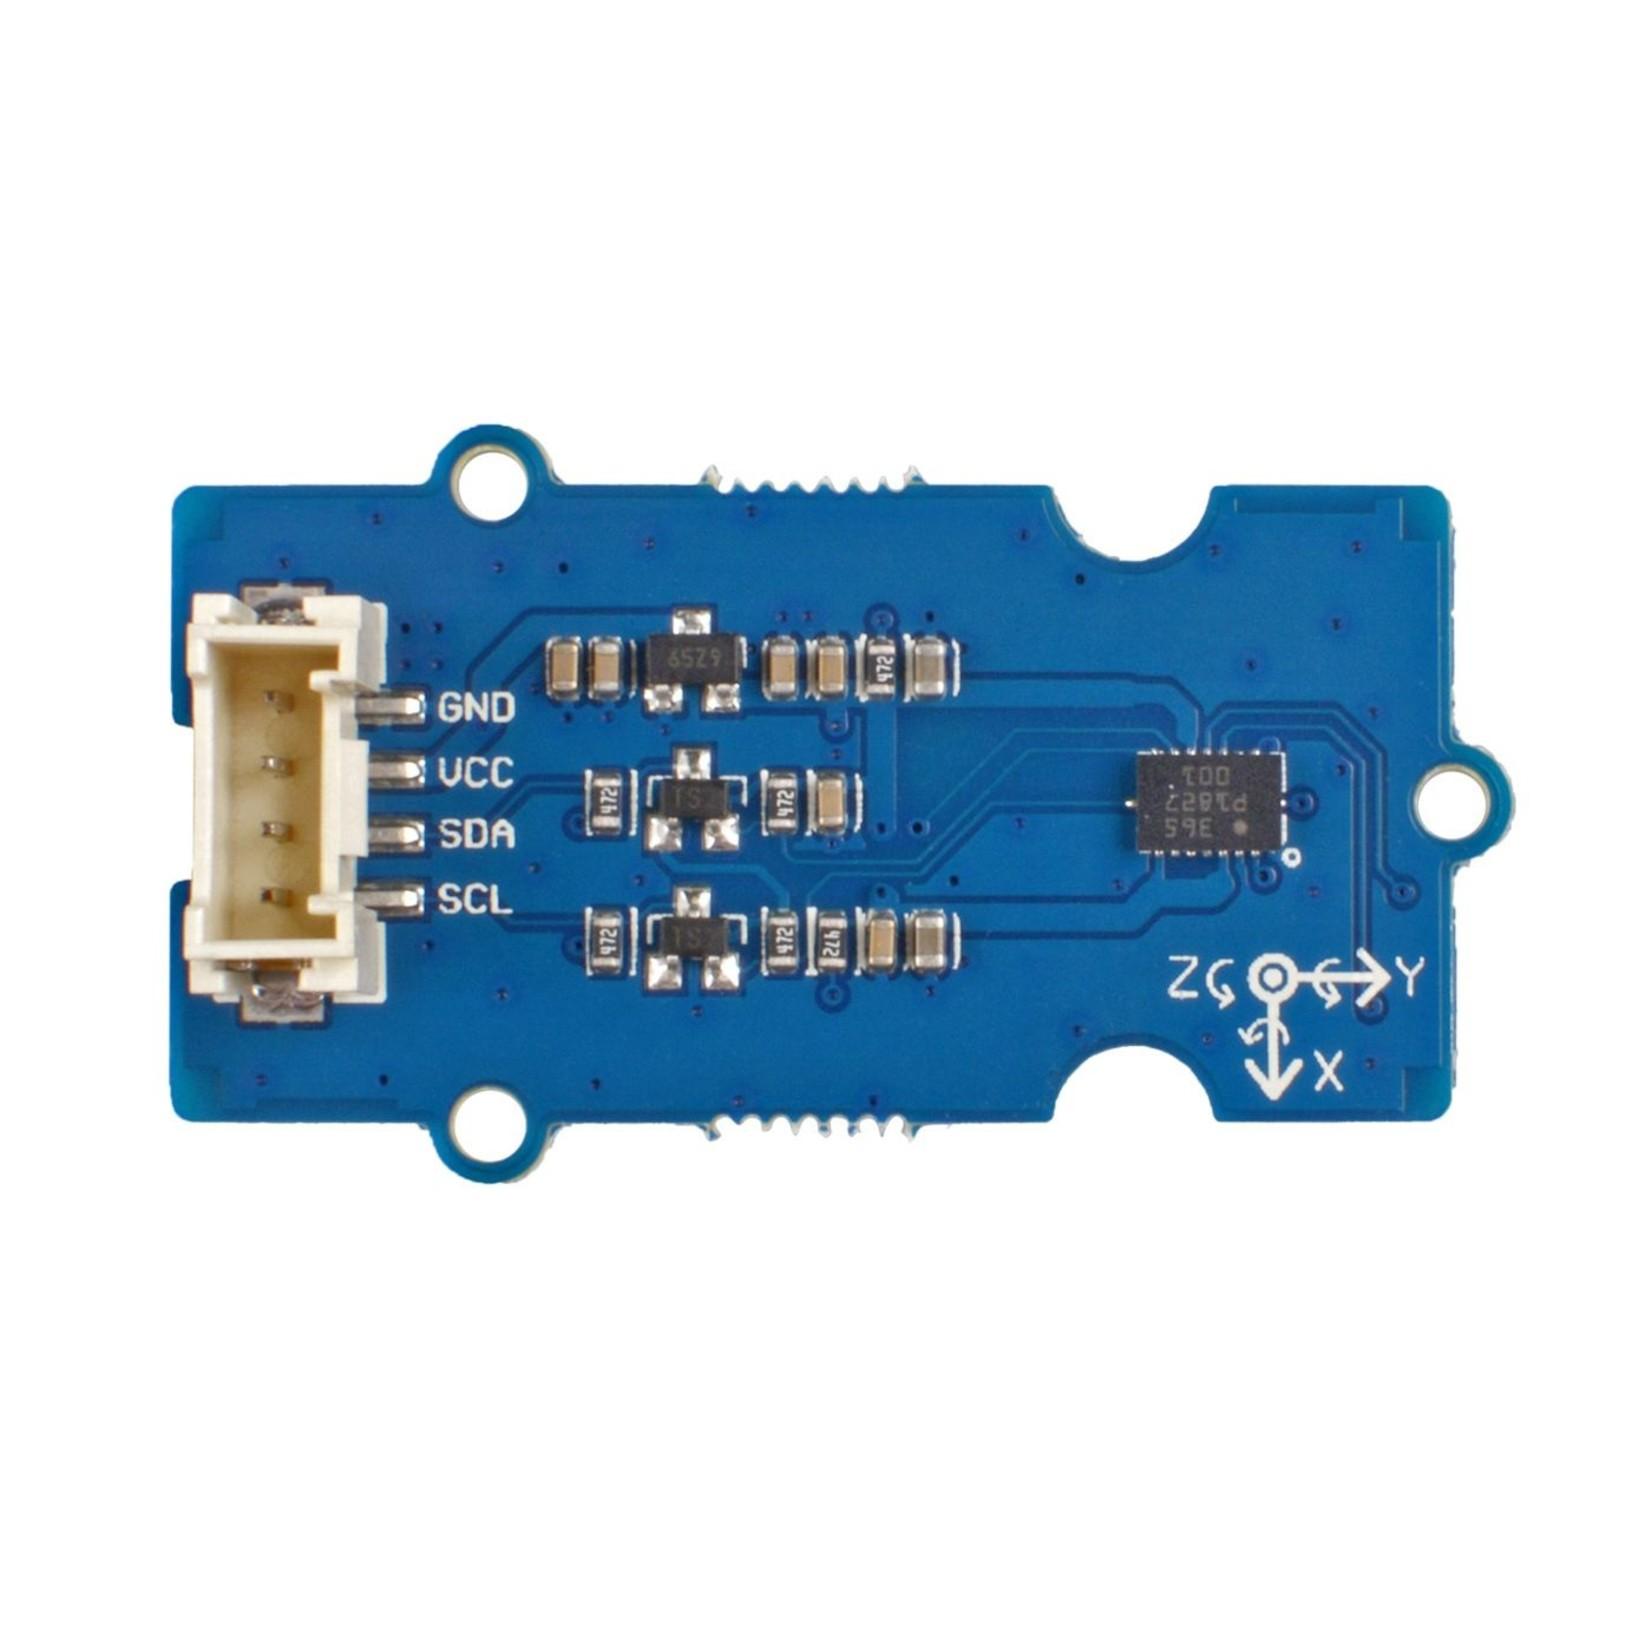 Seeed Grove - 6-Axis Accelerometer&Gyroscope(BMI088)